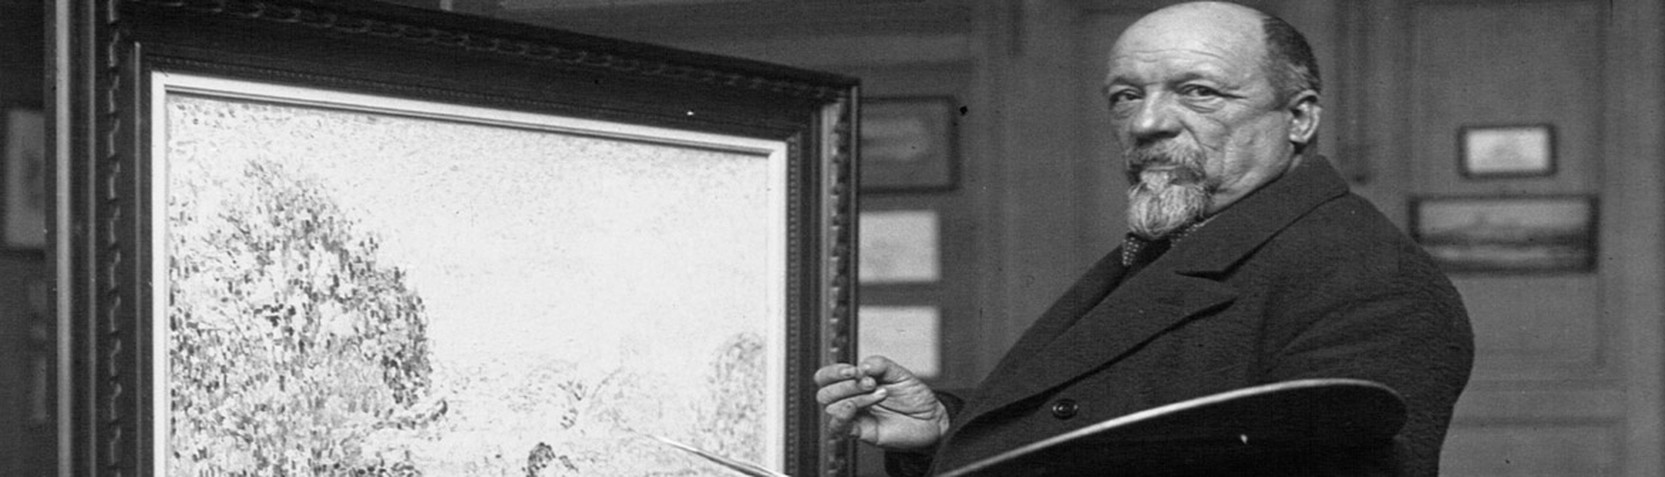 Artists - Paul Signac